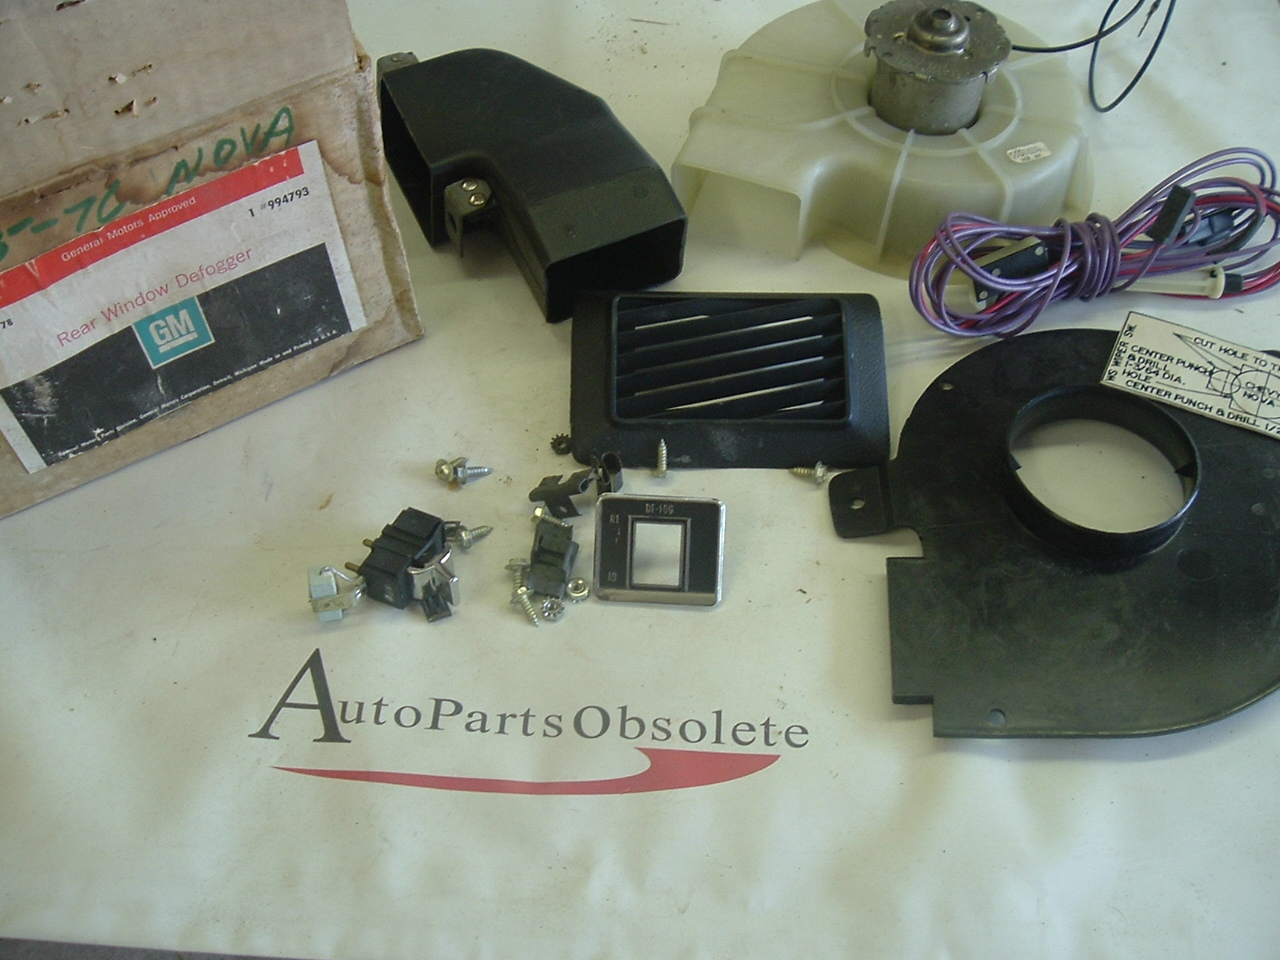 1975 1976 Chevrolet Nova rear defogger kit 994793 (a 994793)